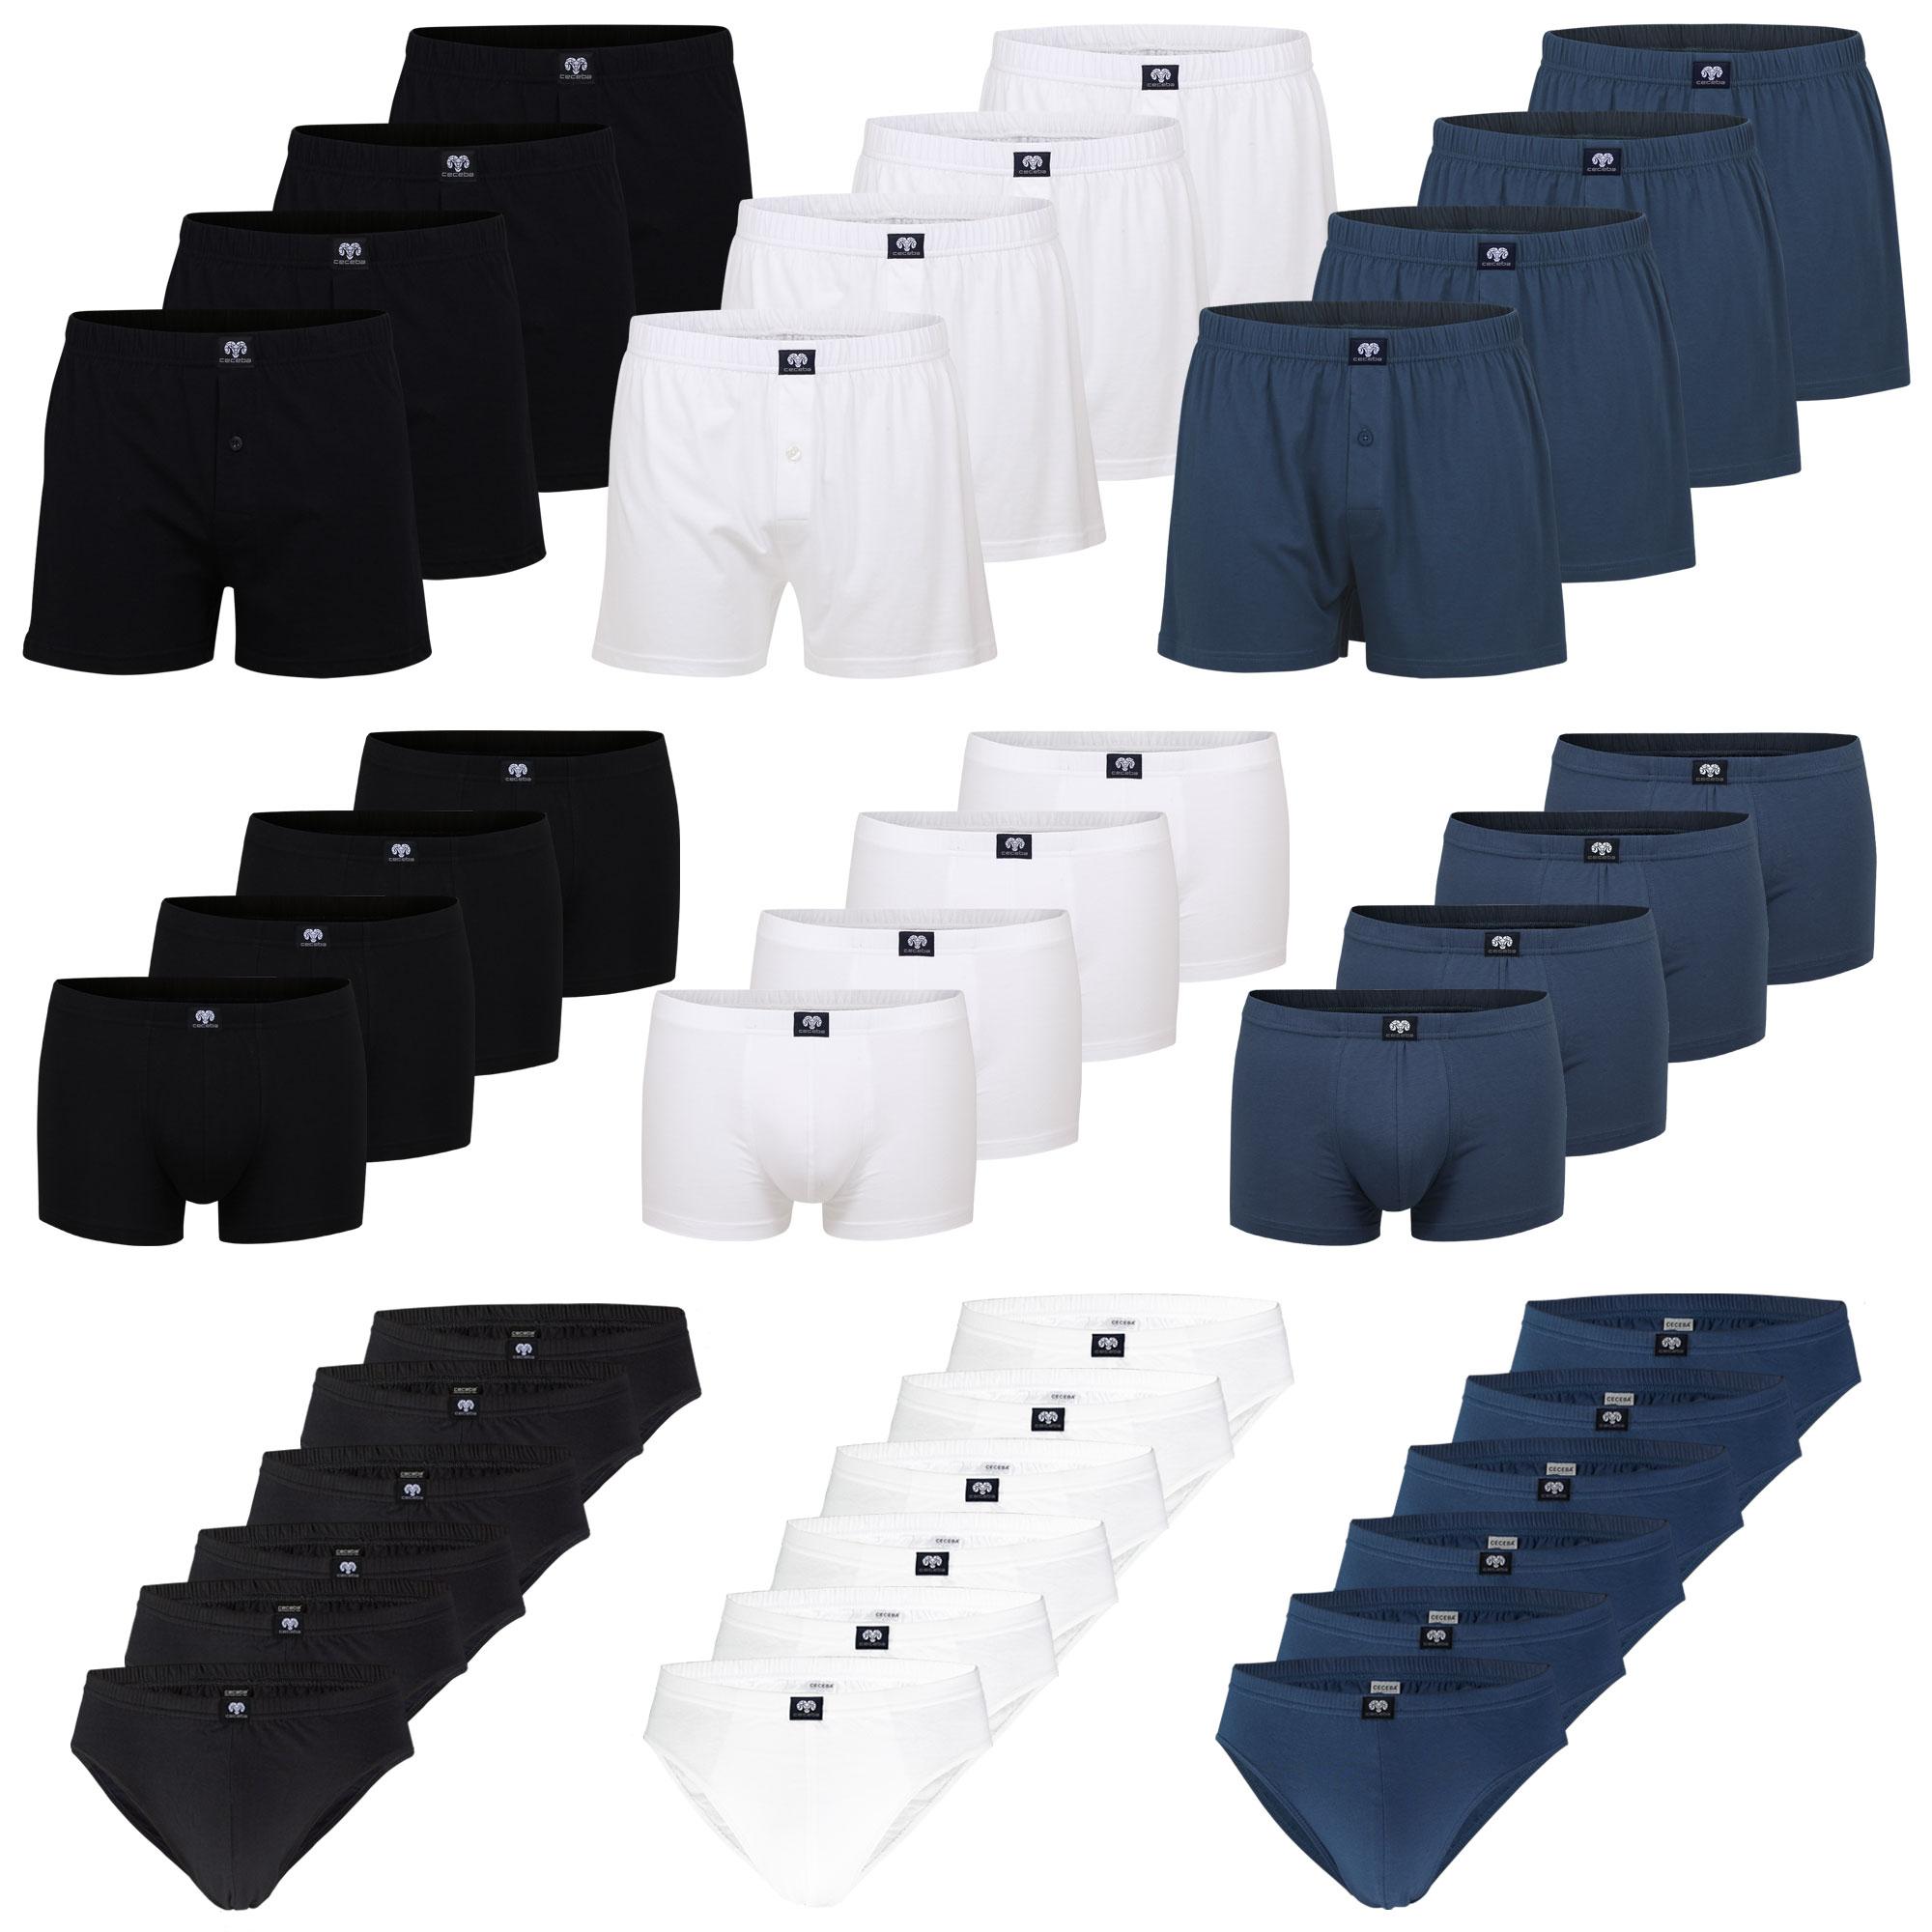 CECEBA Herren Slips, Unterhosen, Pants, Boxershorts, auch Gr. 10, 12, 14, 16, 18 – Bild 1